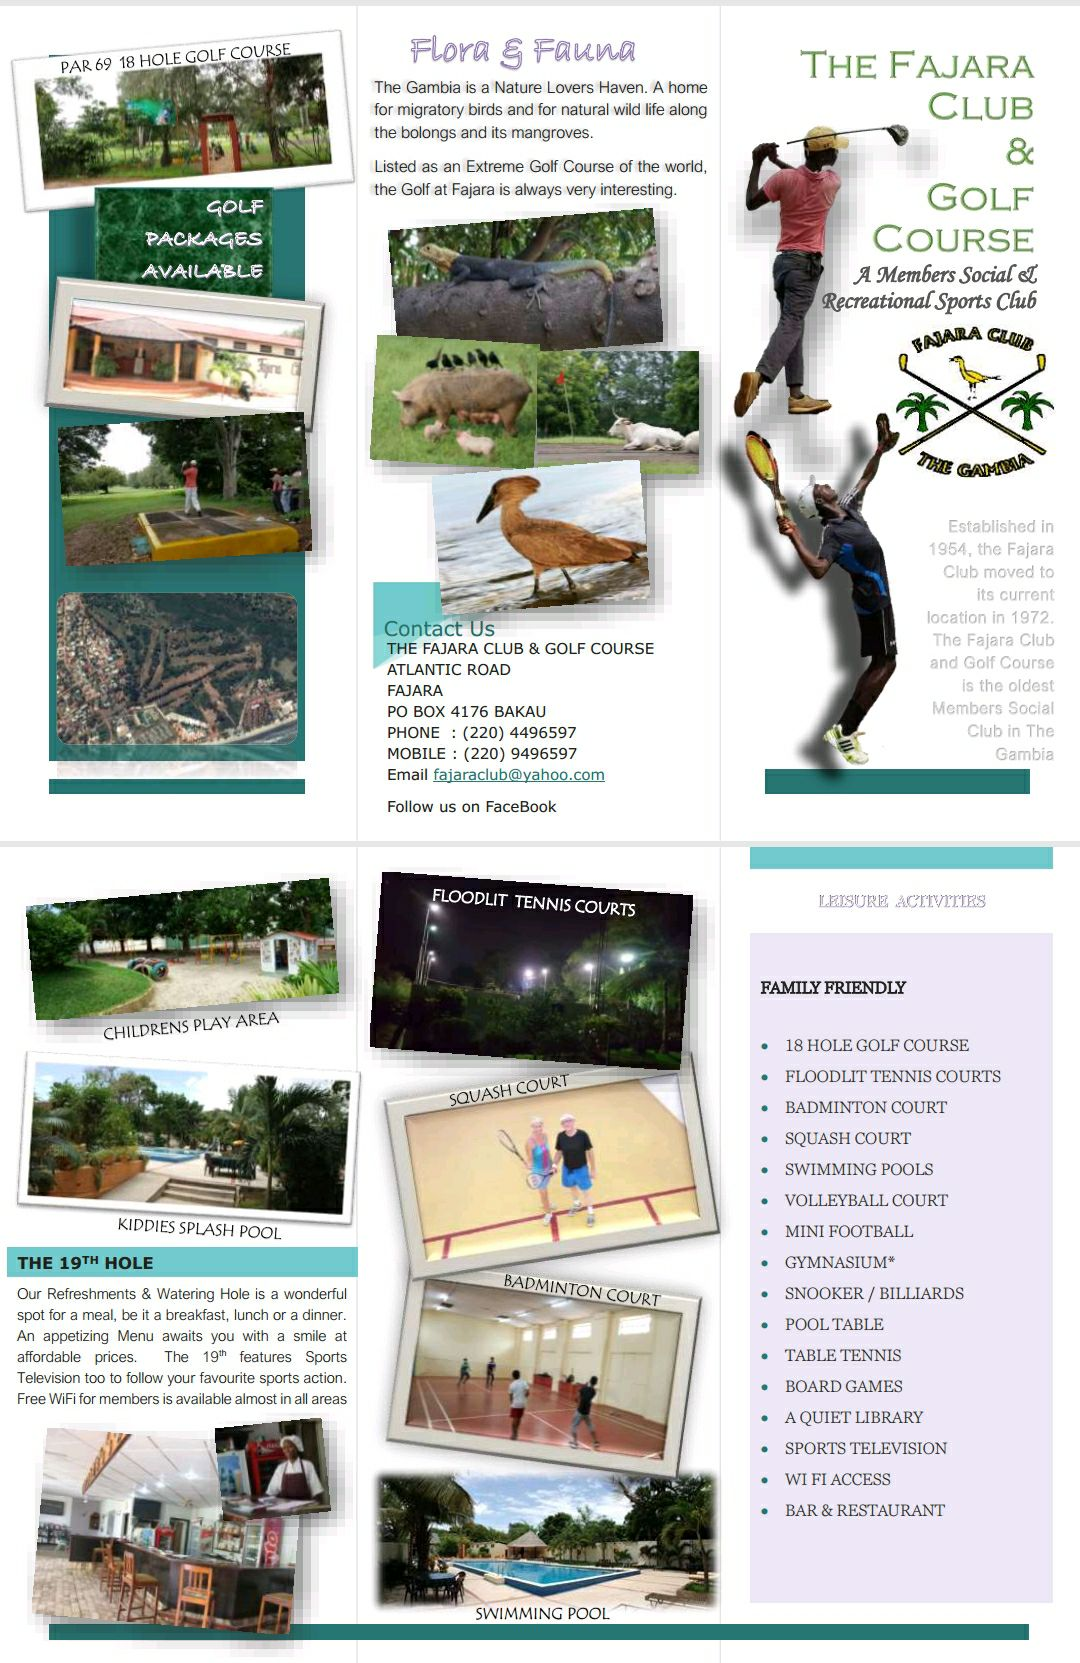 Fajara Club - The Fajara Golf Course, Hotels, Travel, Places,